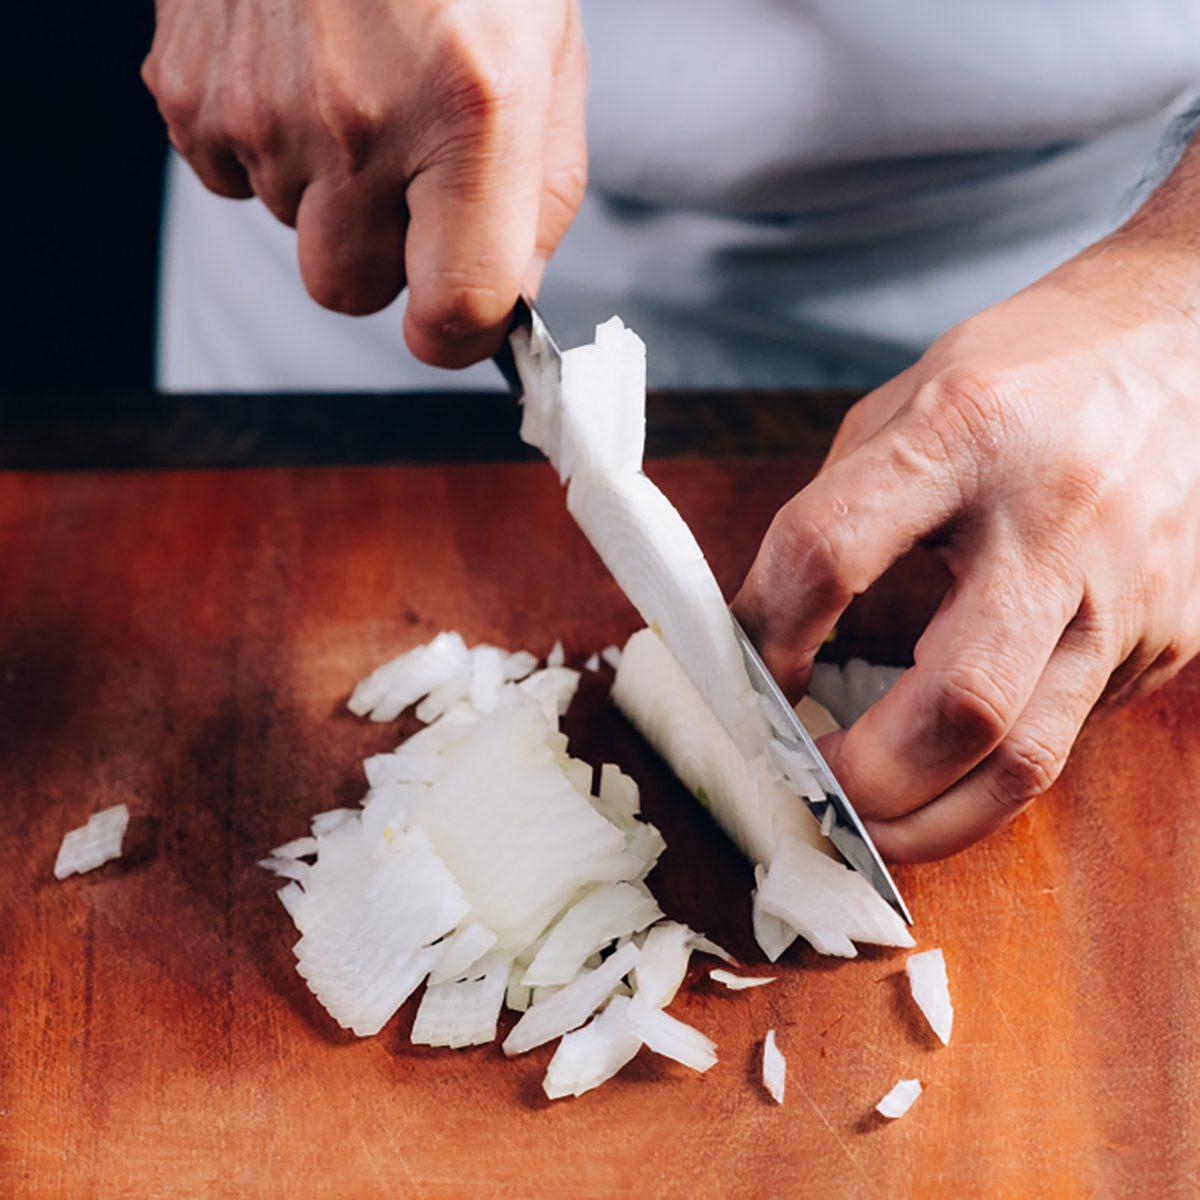 Chopping an Onion using A Knife